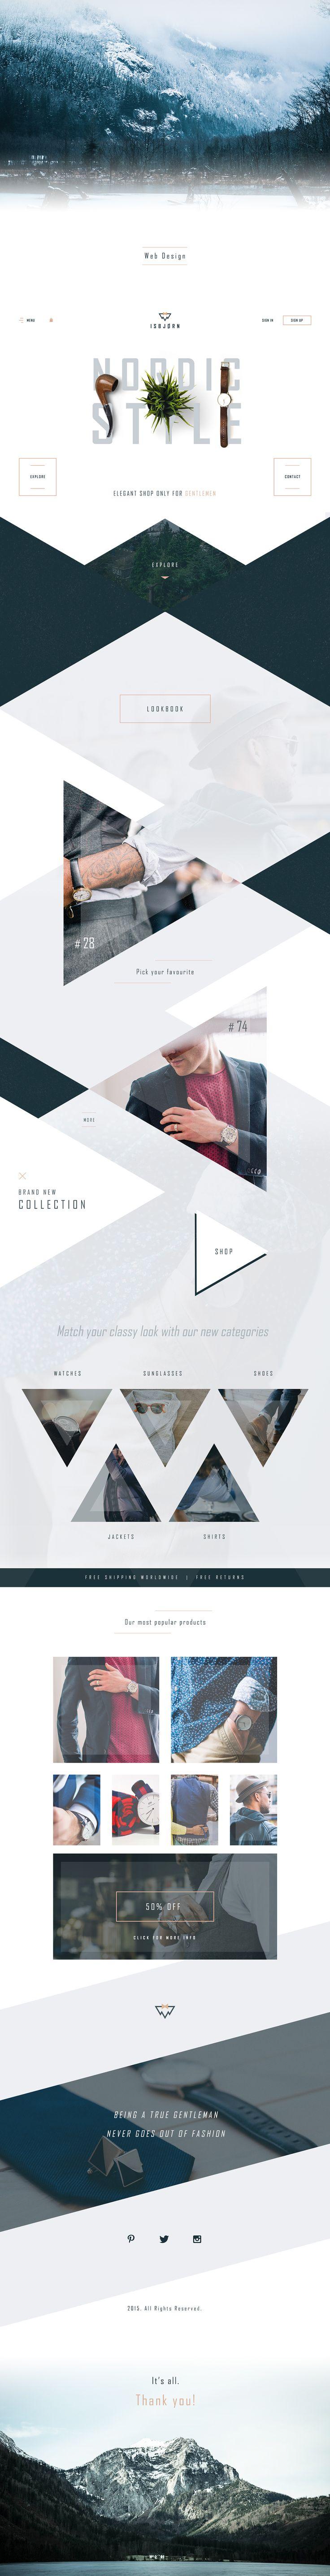 Isbjorn Web Design Branding Portfolio Webdesign